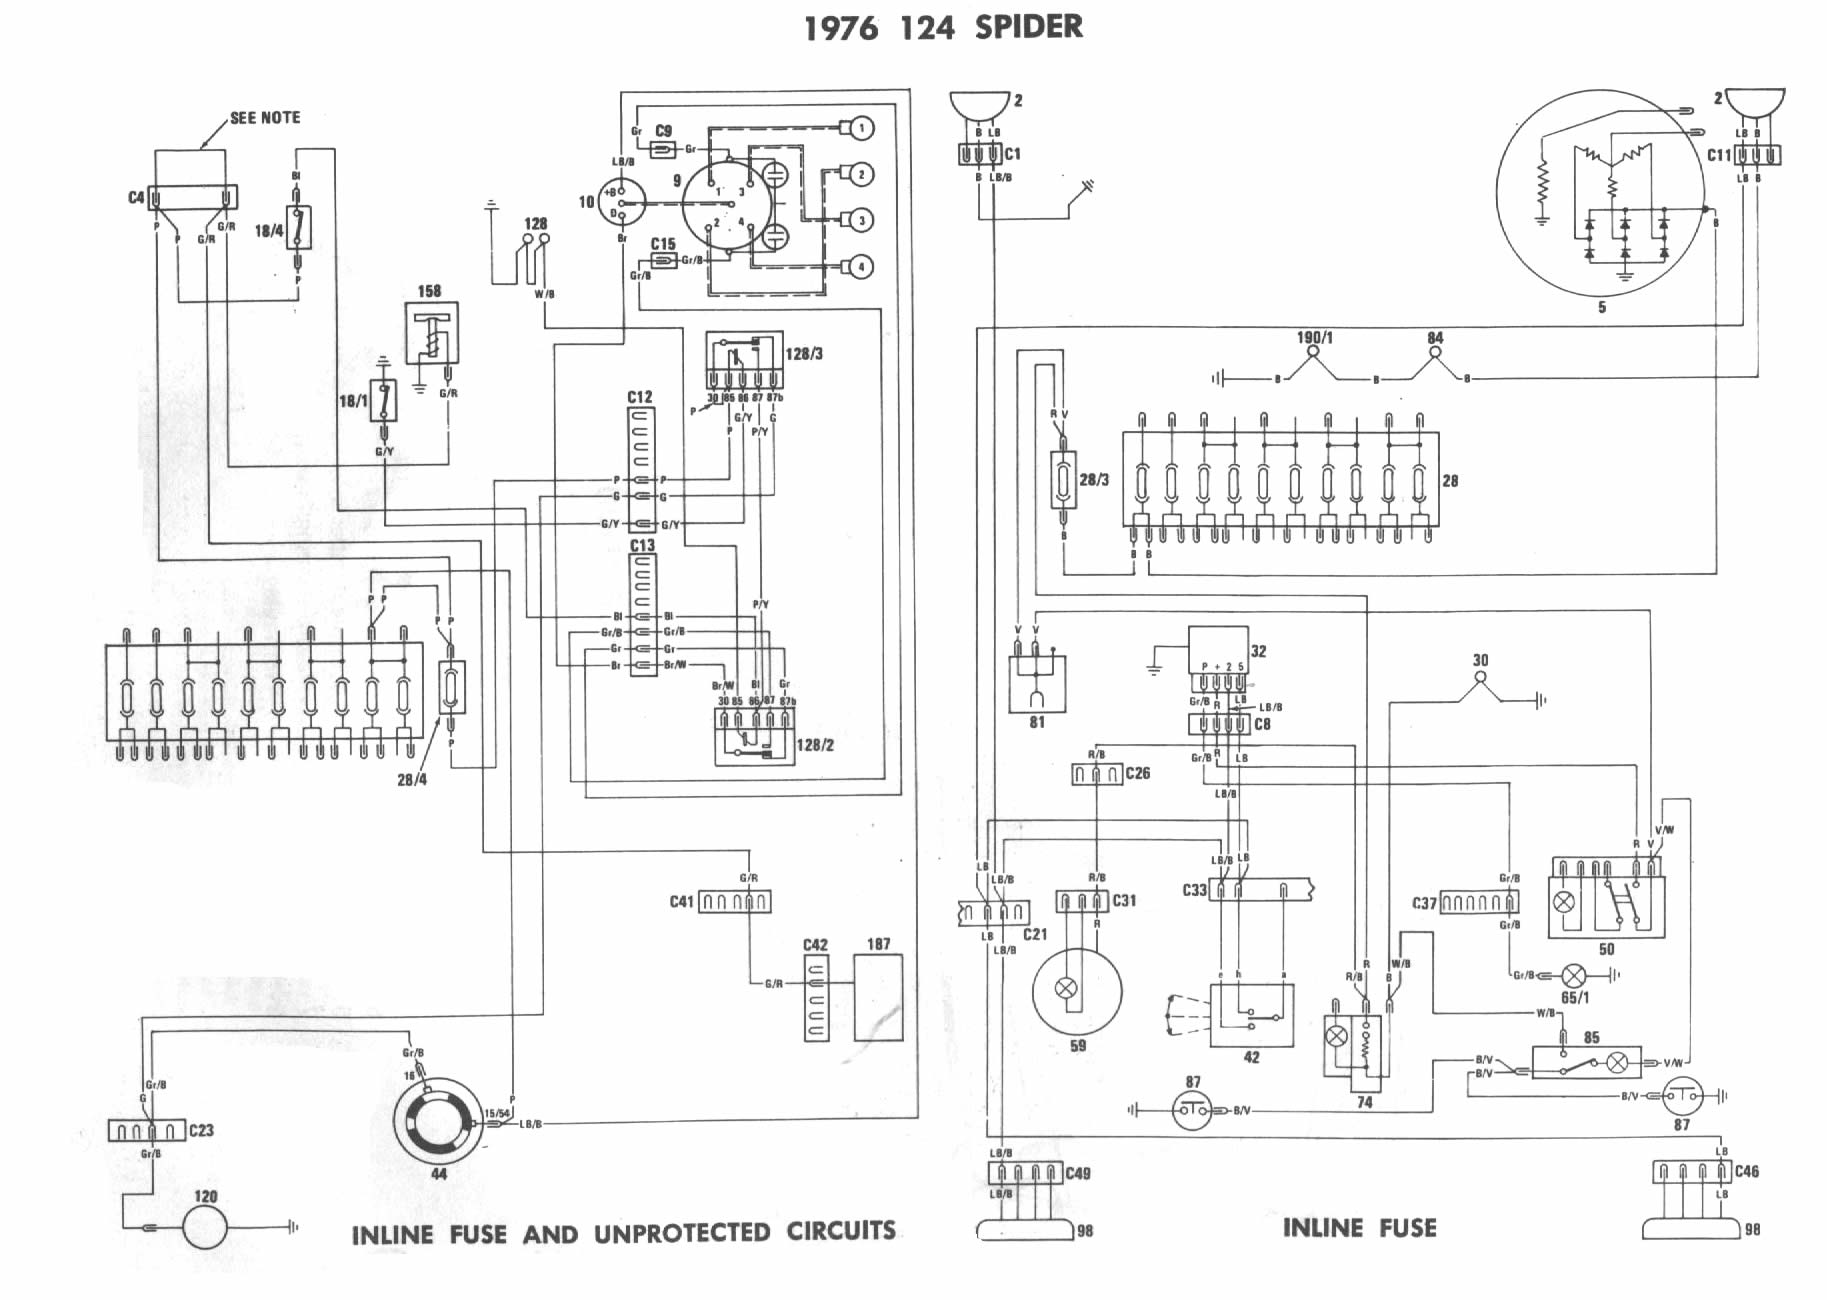 fiat scudo van wiring diagram schematics wiring diagrams u2022 rh seniorlivinguniversity co fiat scudo electrical diagram fiat scudo 2007 wiring diagram